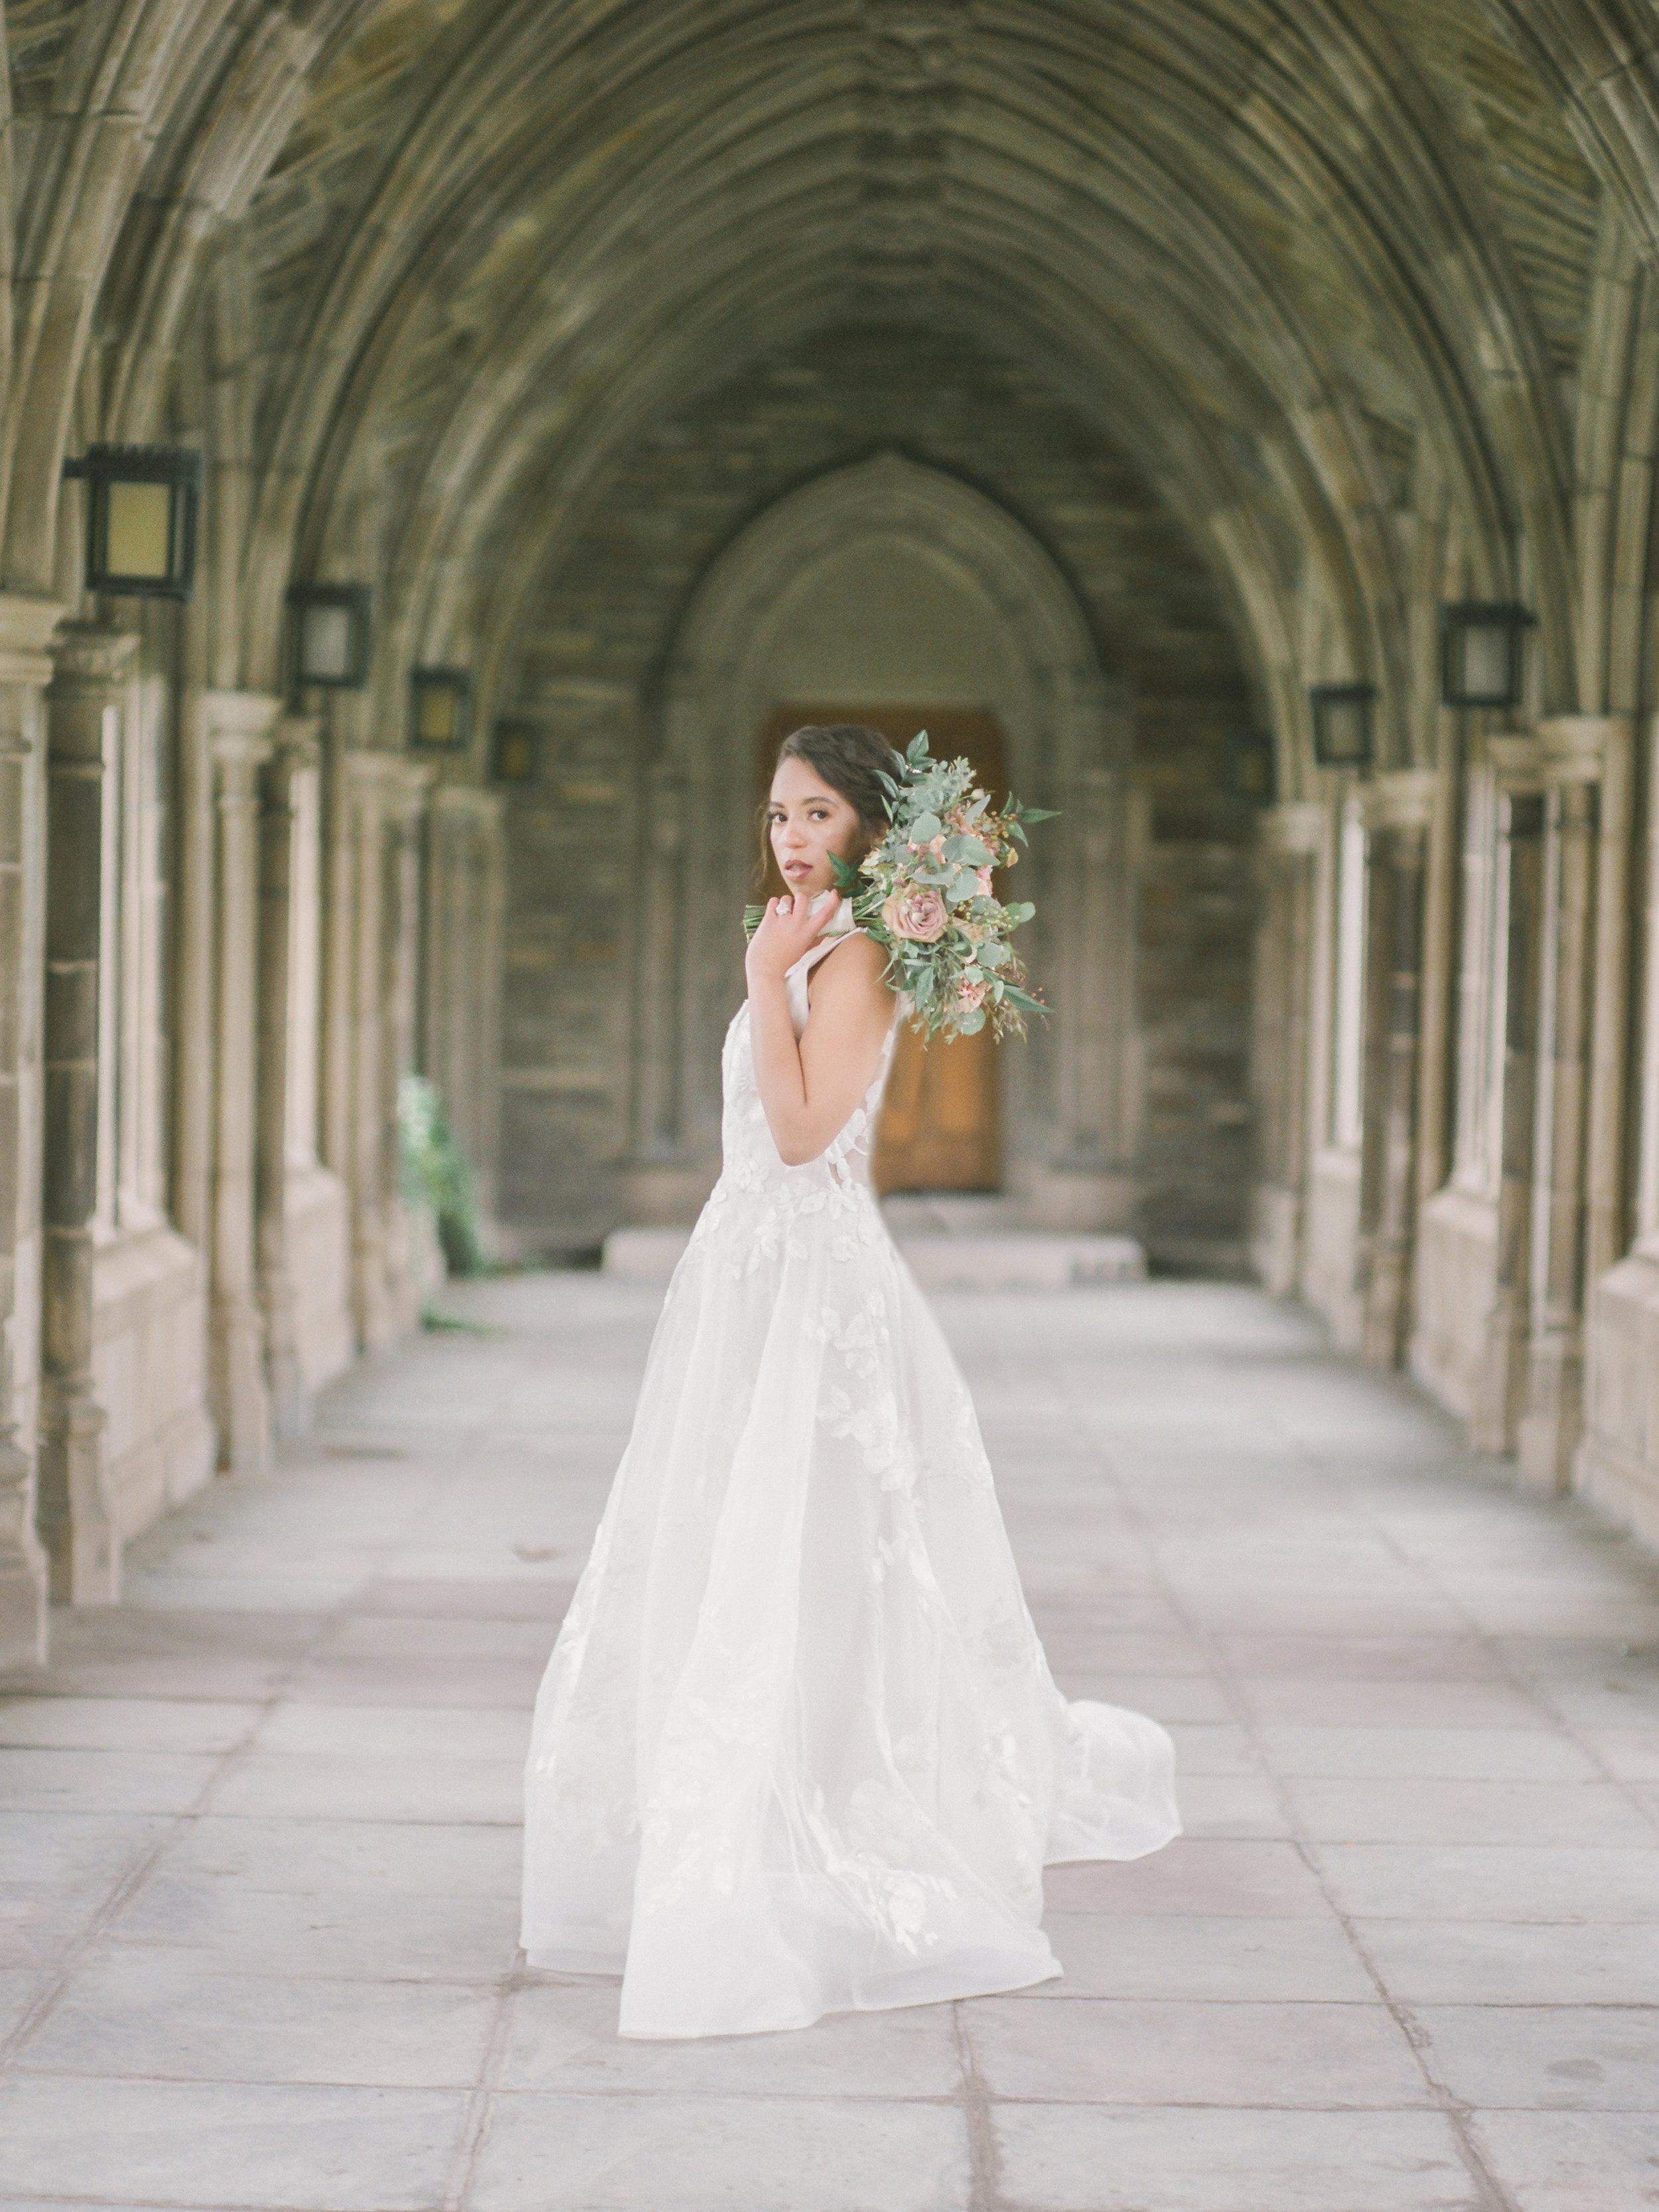 Ithaca New York-Brides Story-Manda Weaver-Wedding-16.jpg